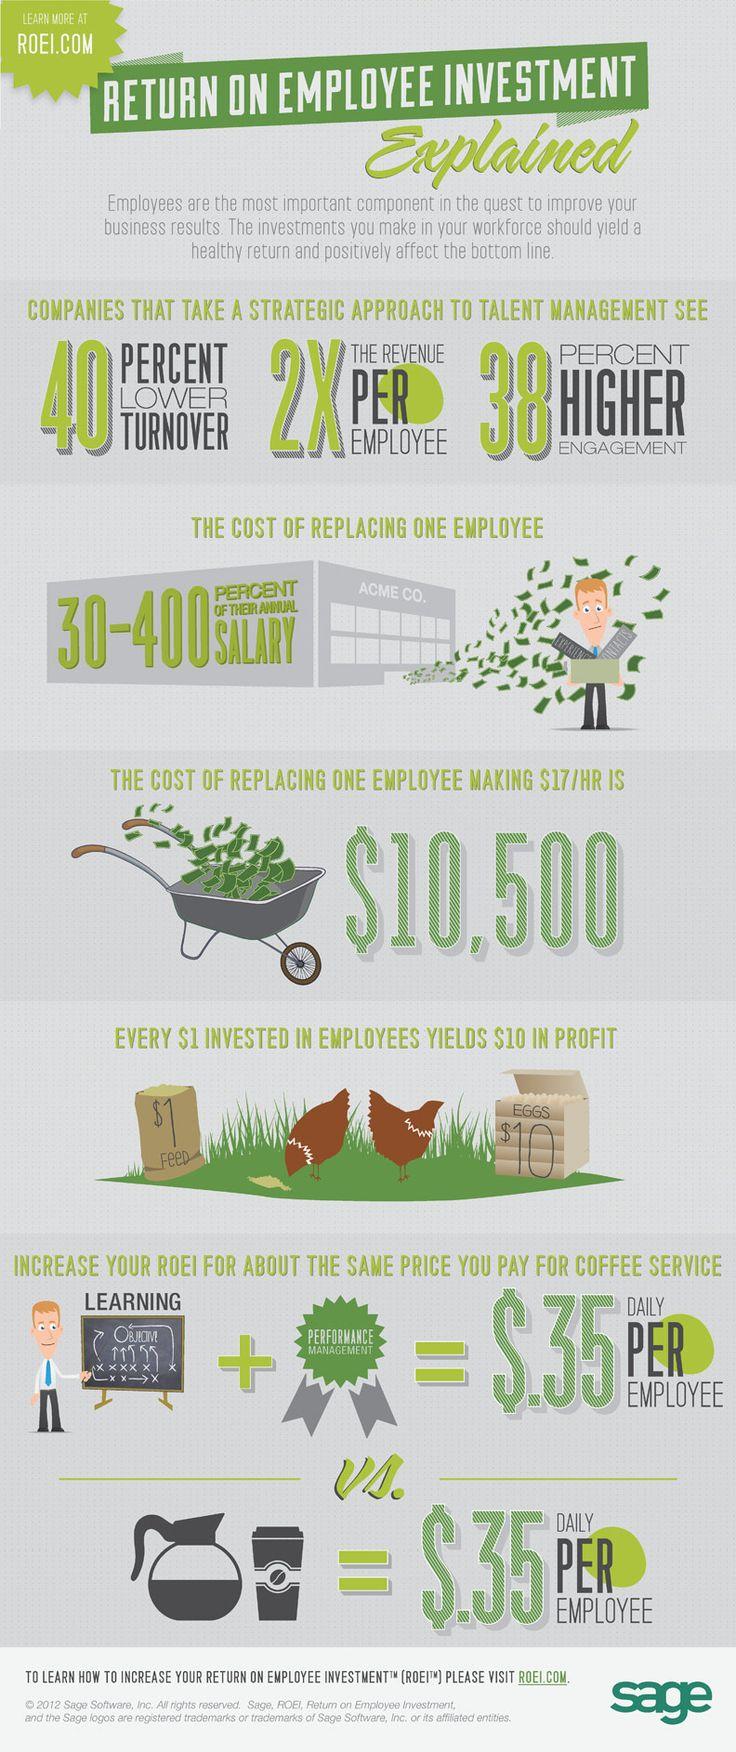 Return on Employee Investment: Explained